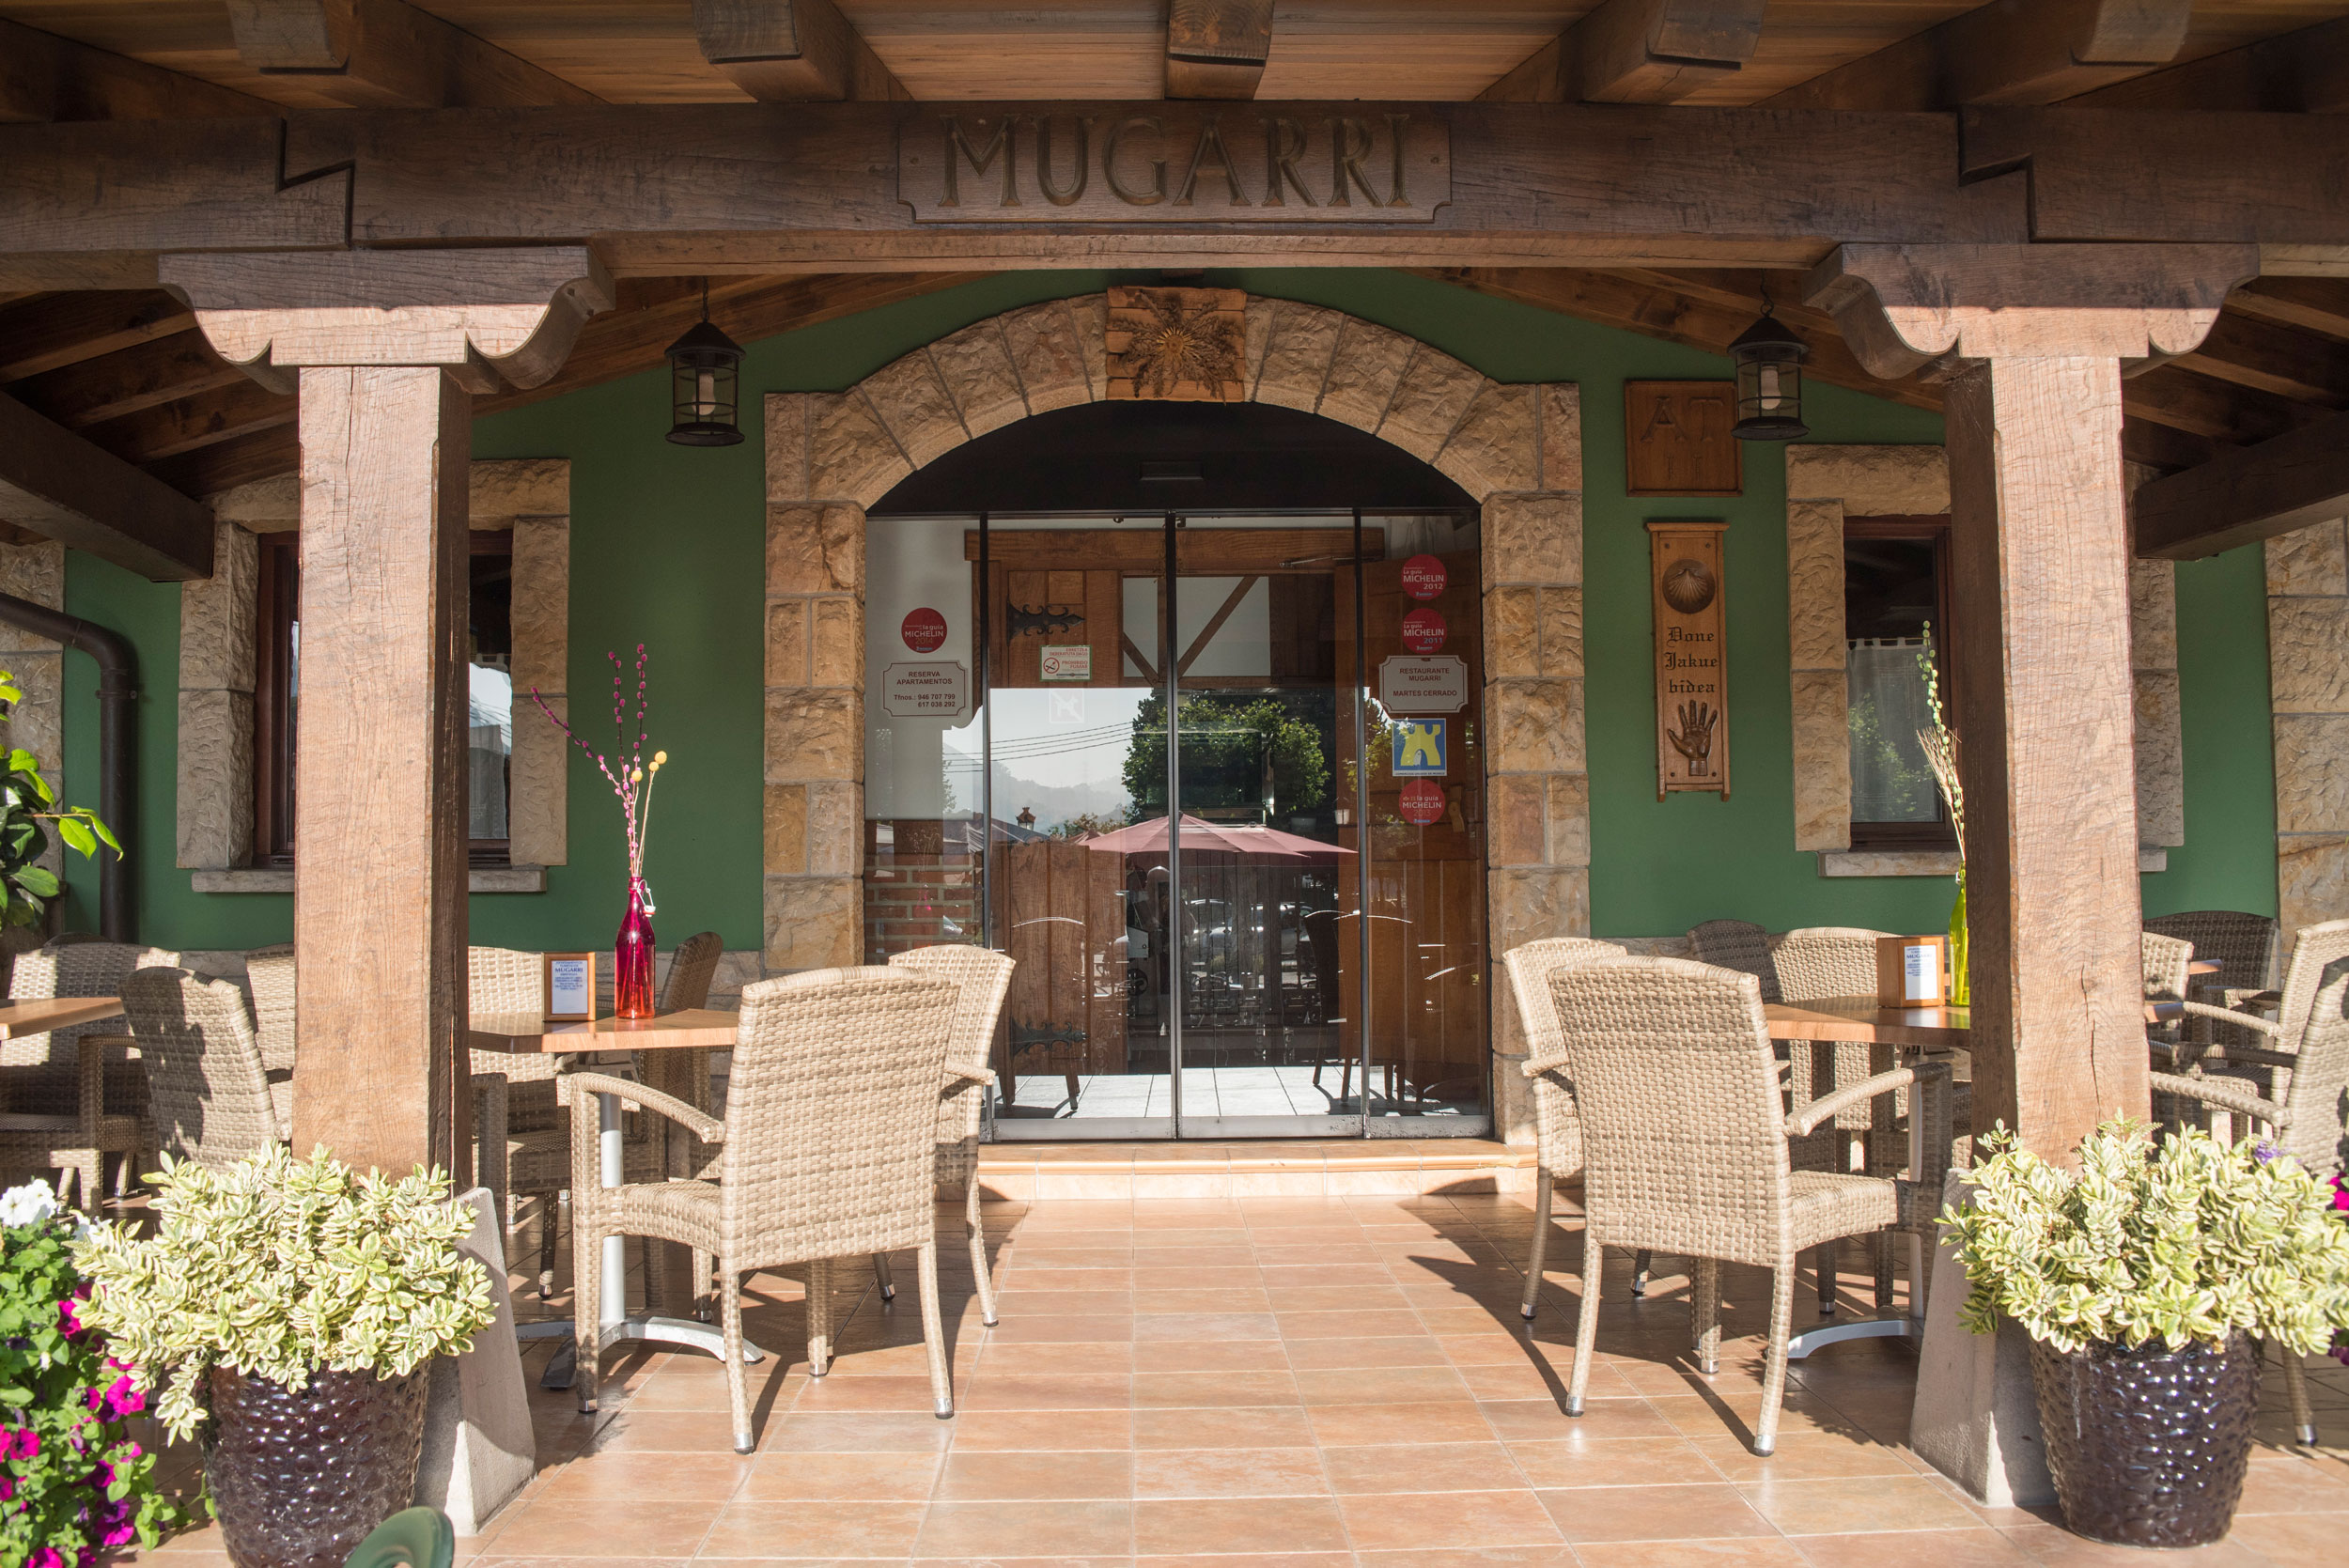 Restaurante-Mugarri-Entrada.jpg